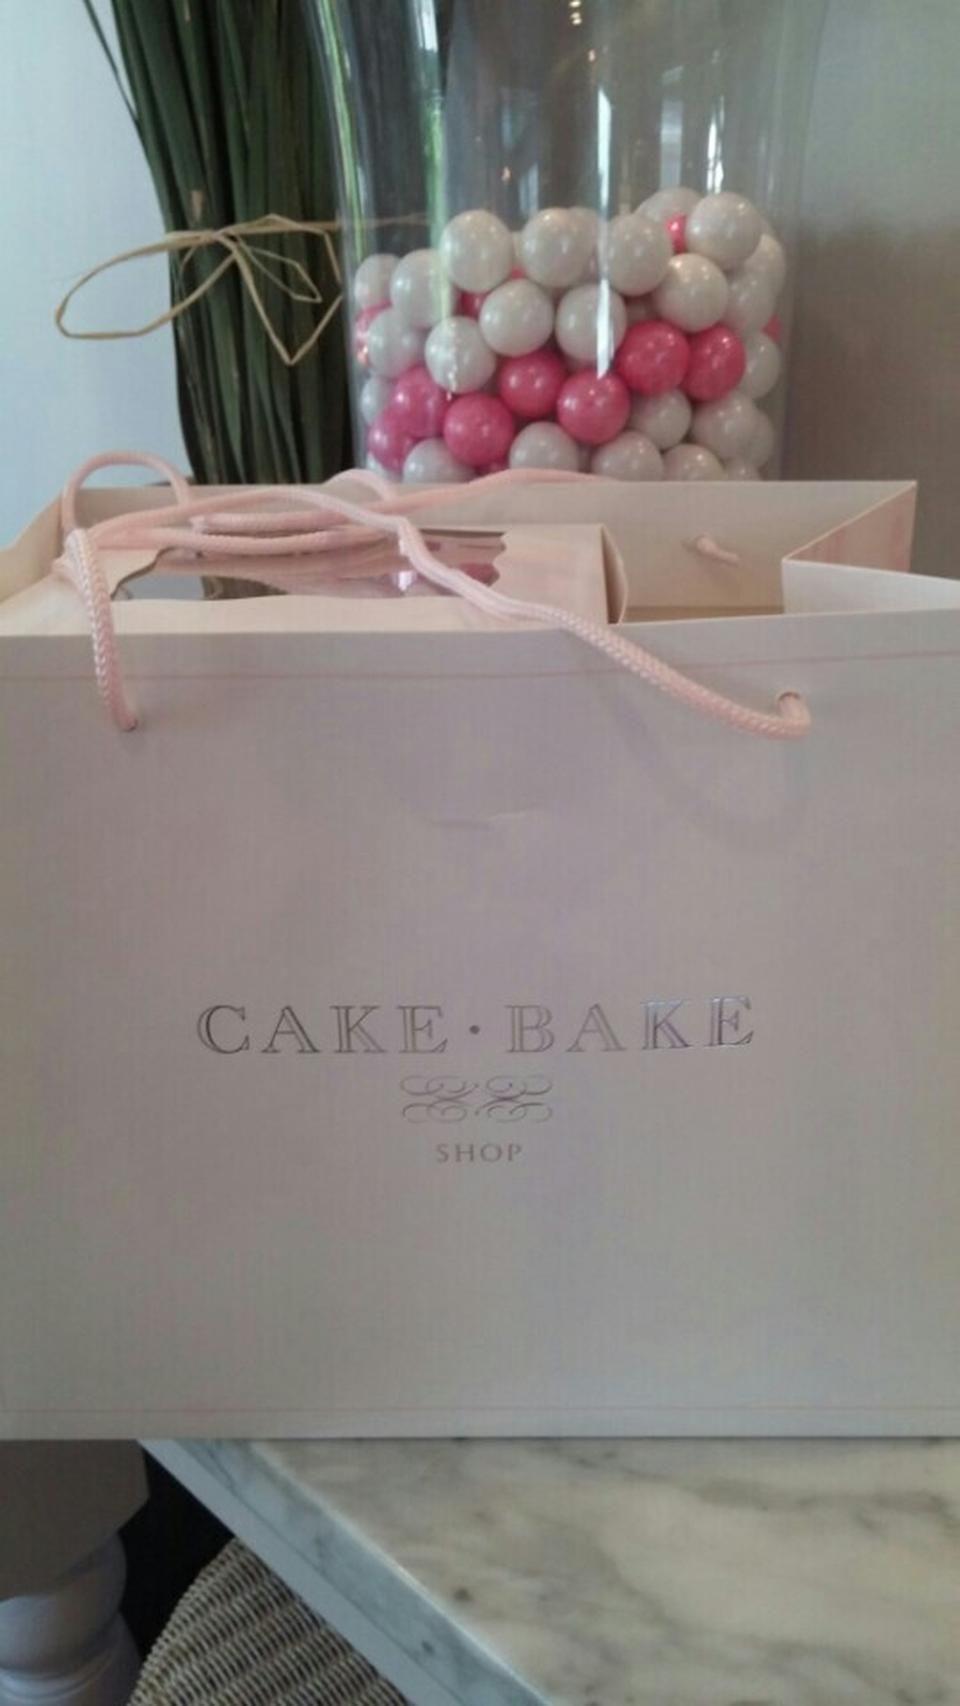 17++ Cake bake menu broad ripple ideas